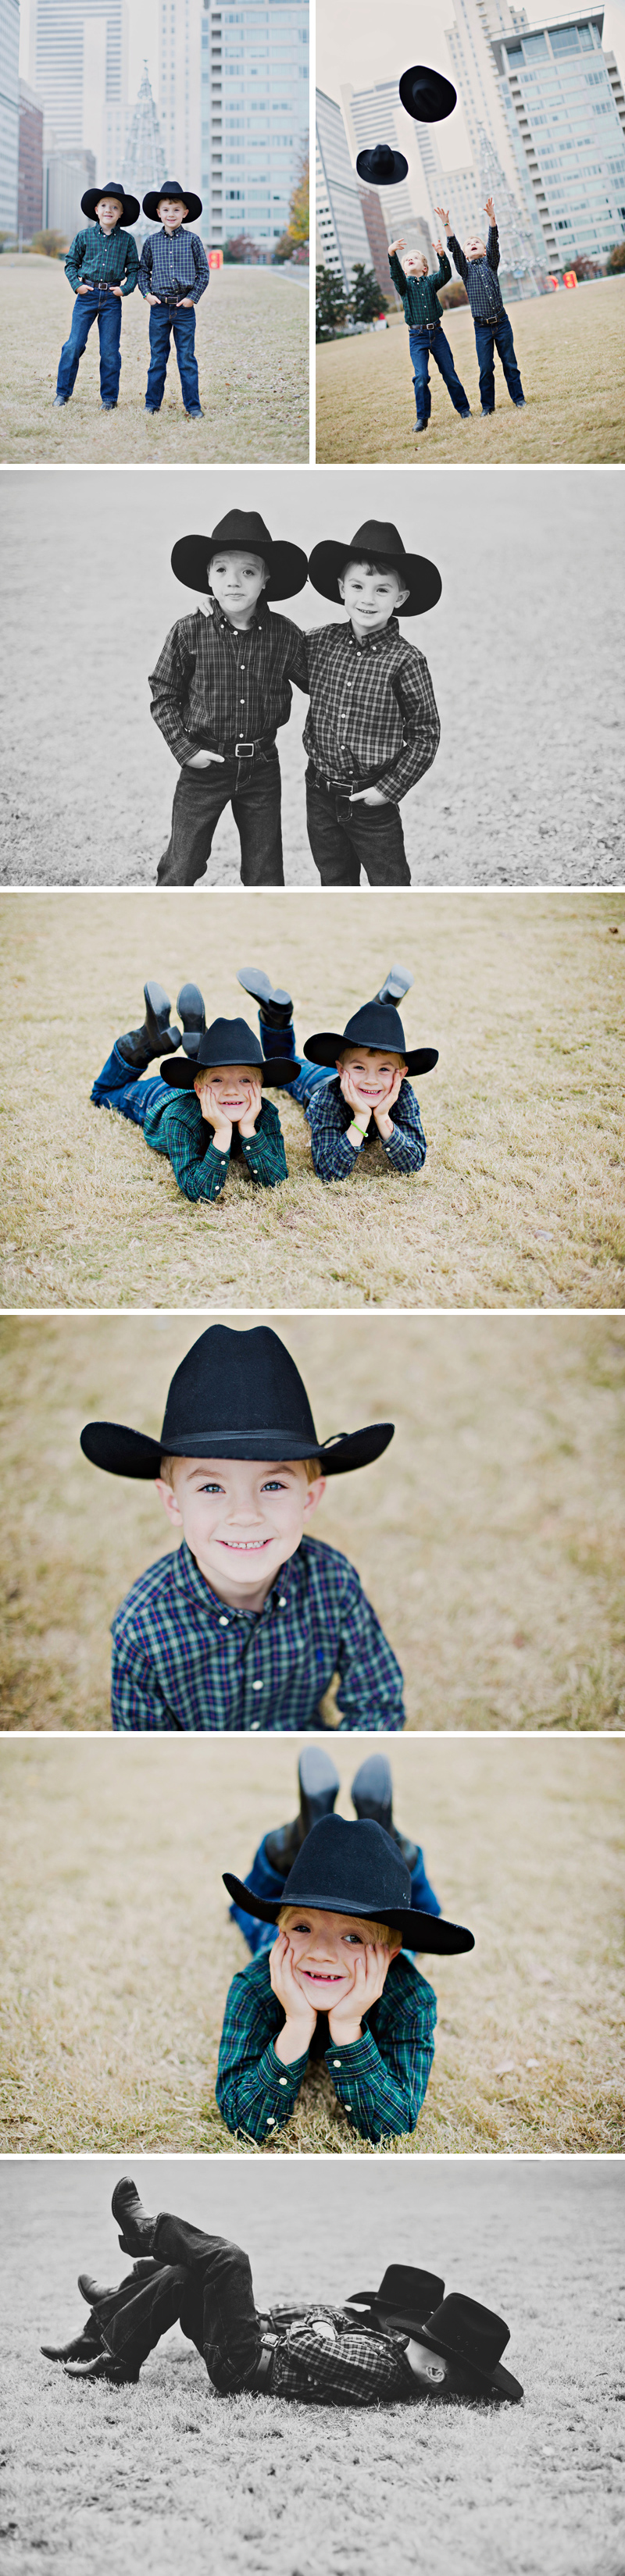 Dallas-Family-Photographerc080